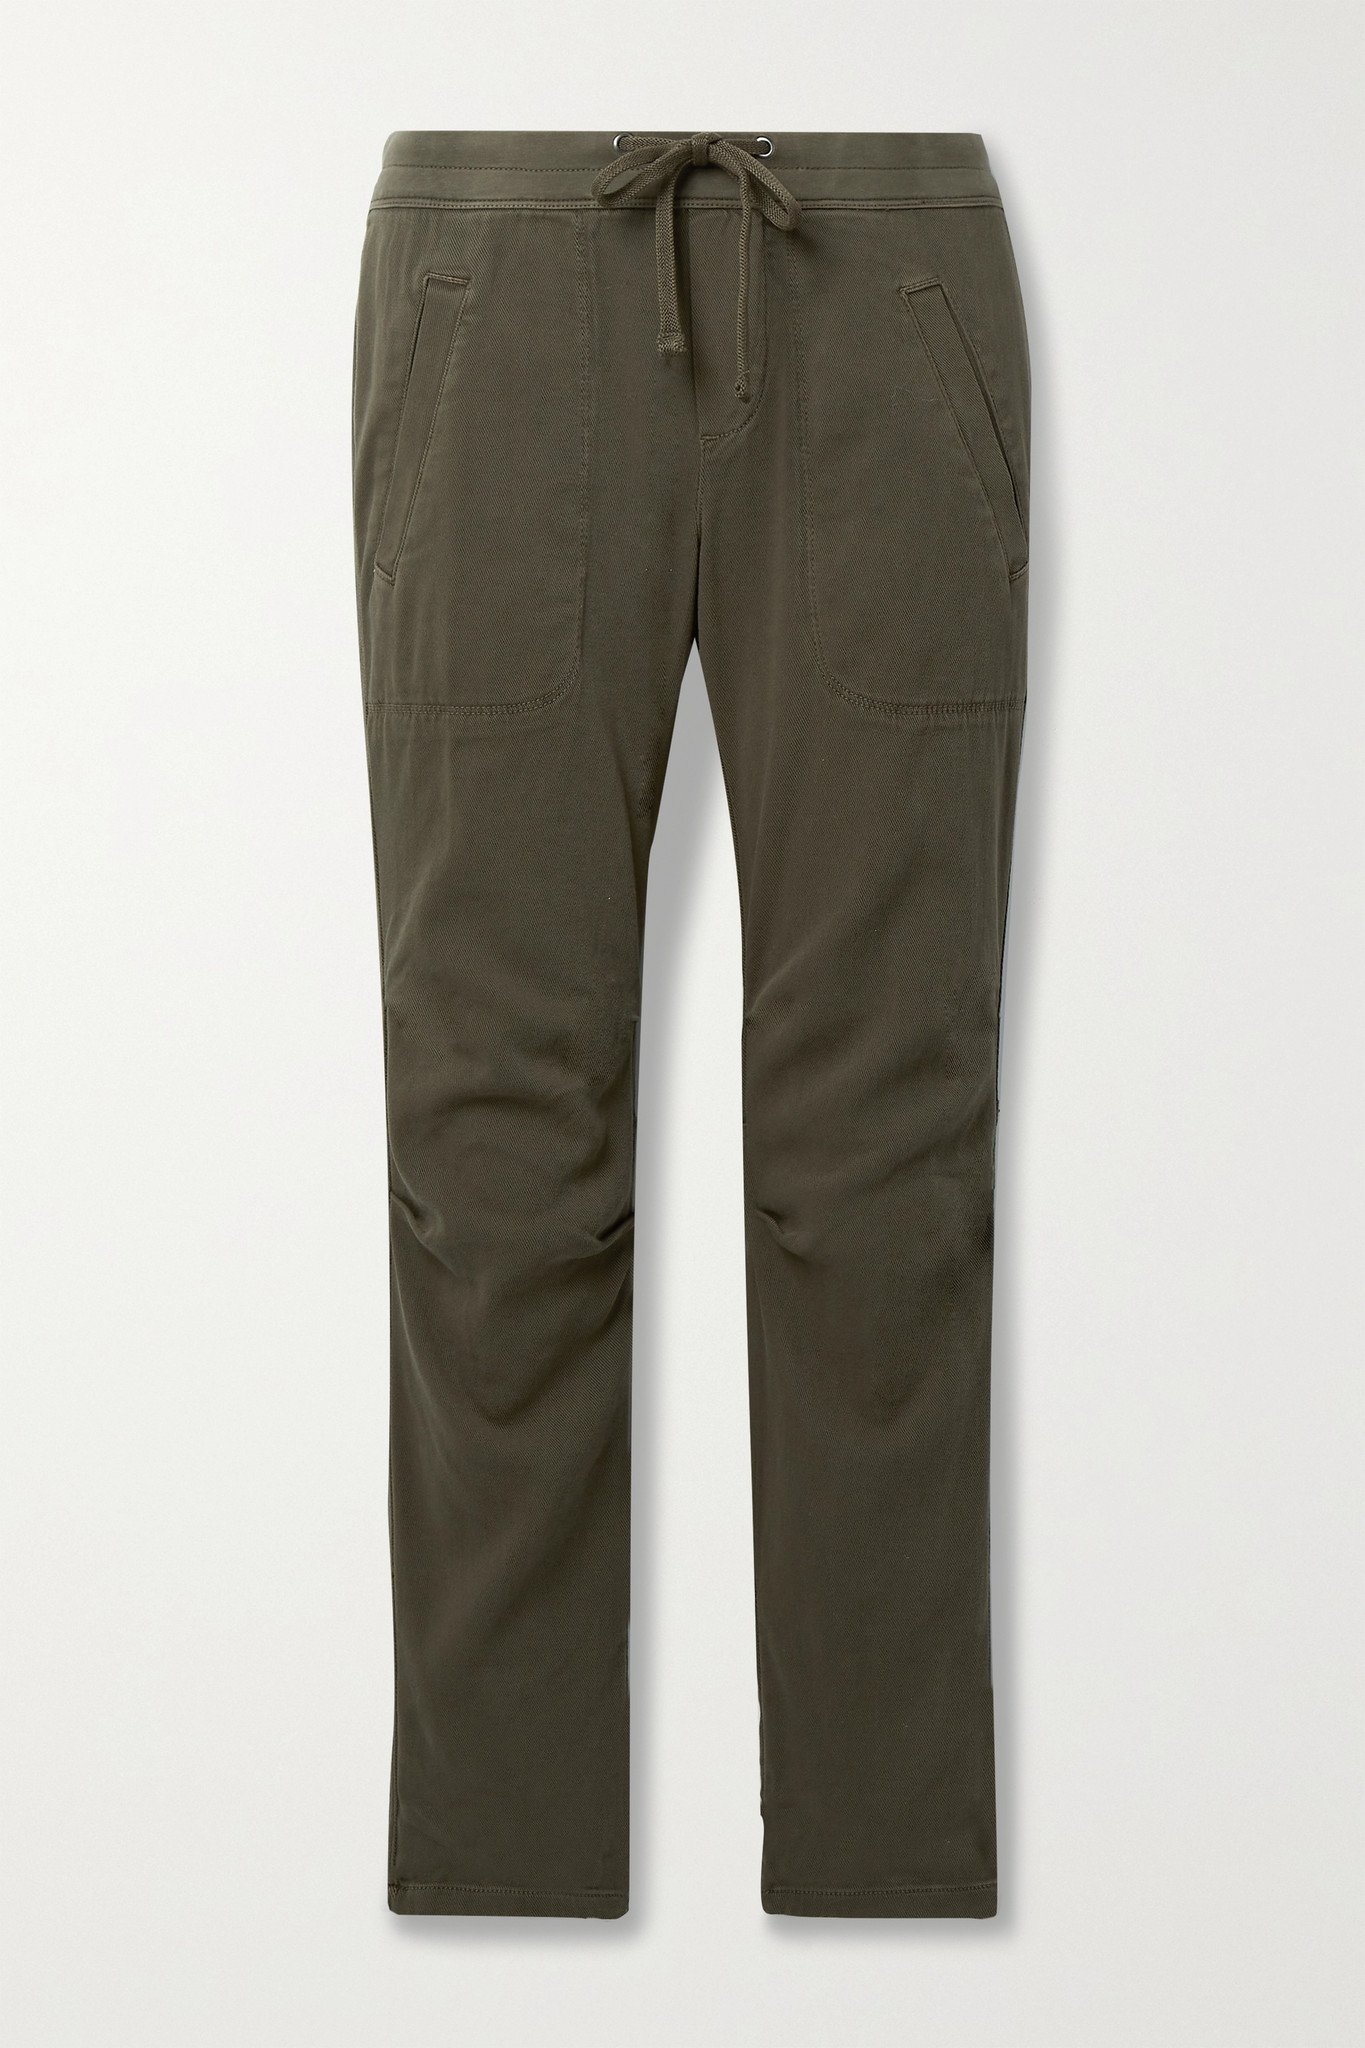 JAMES PERSE - 棉质混纺斜纹布休闲裤 - 绿色 - 4